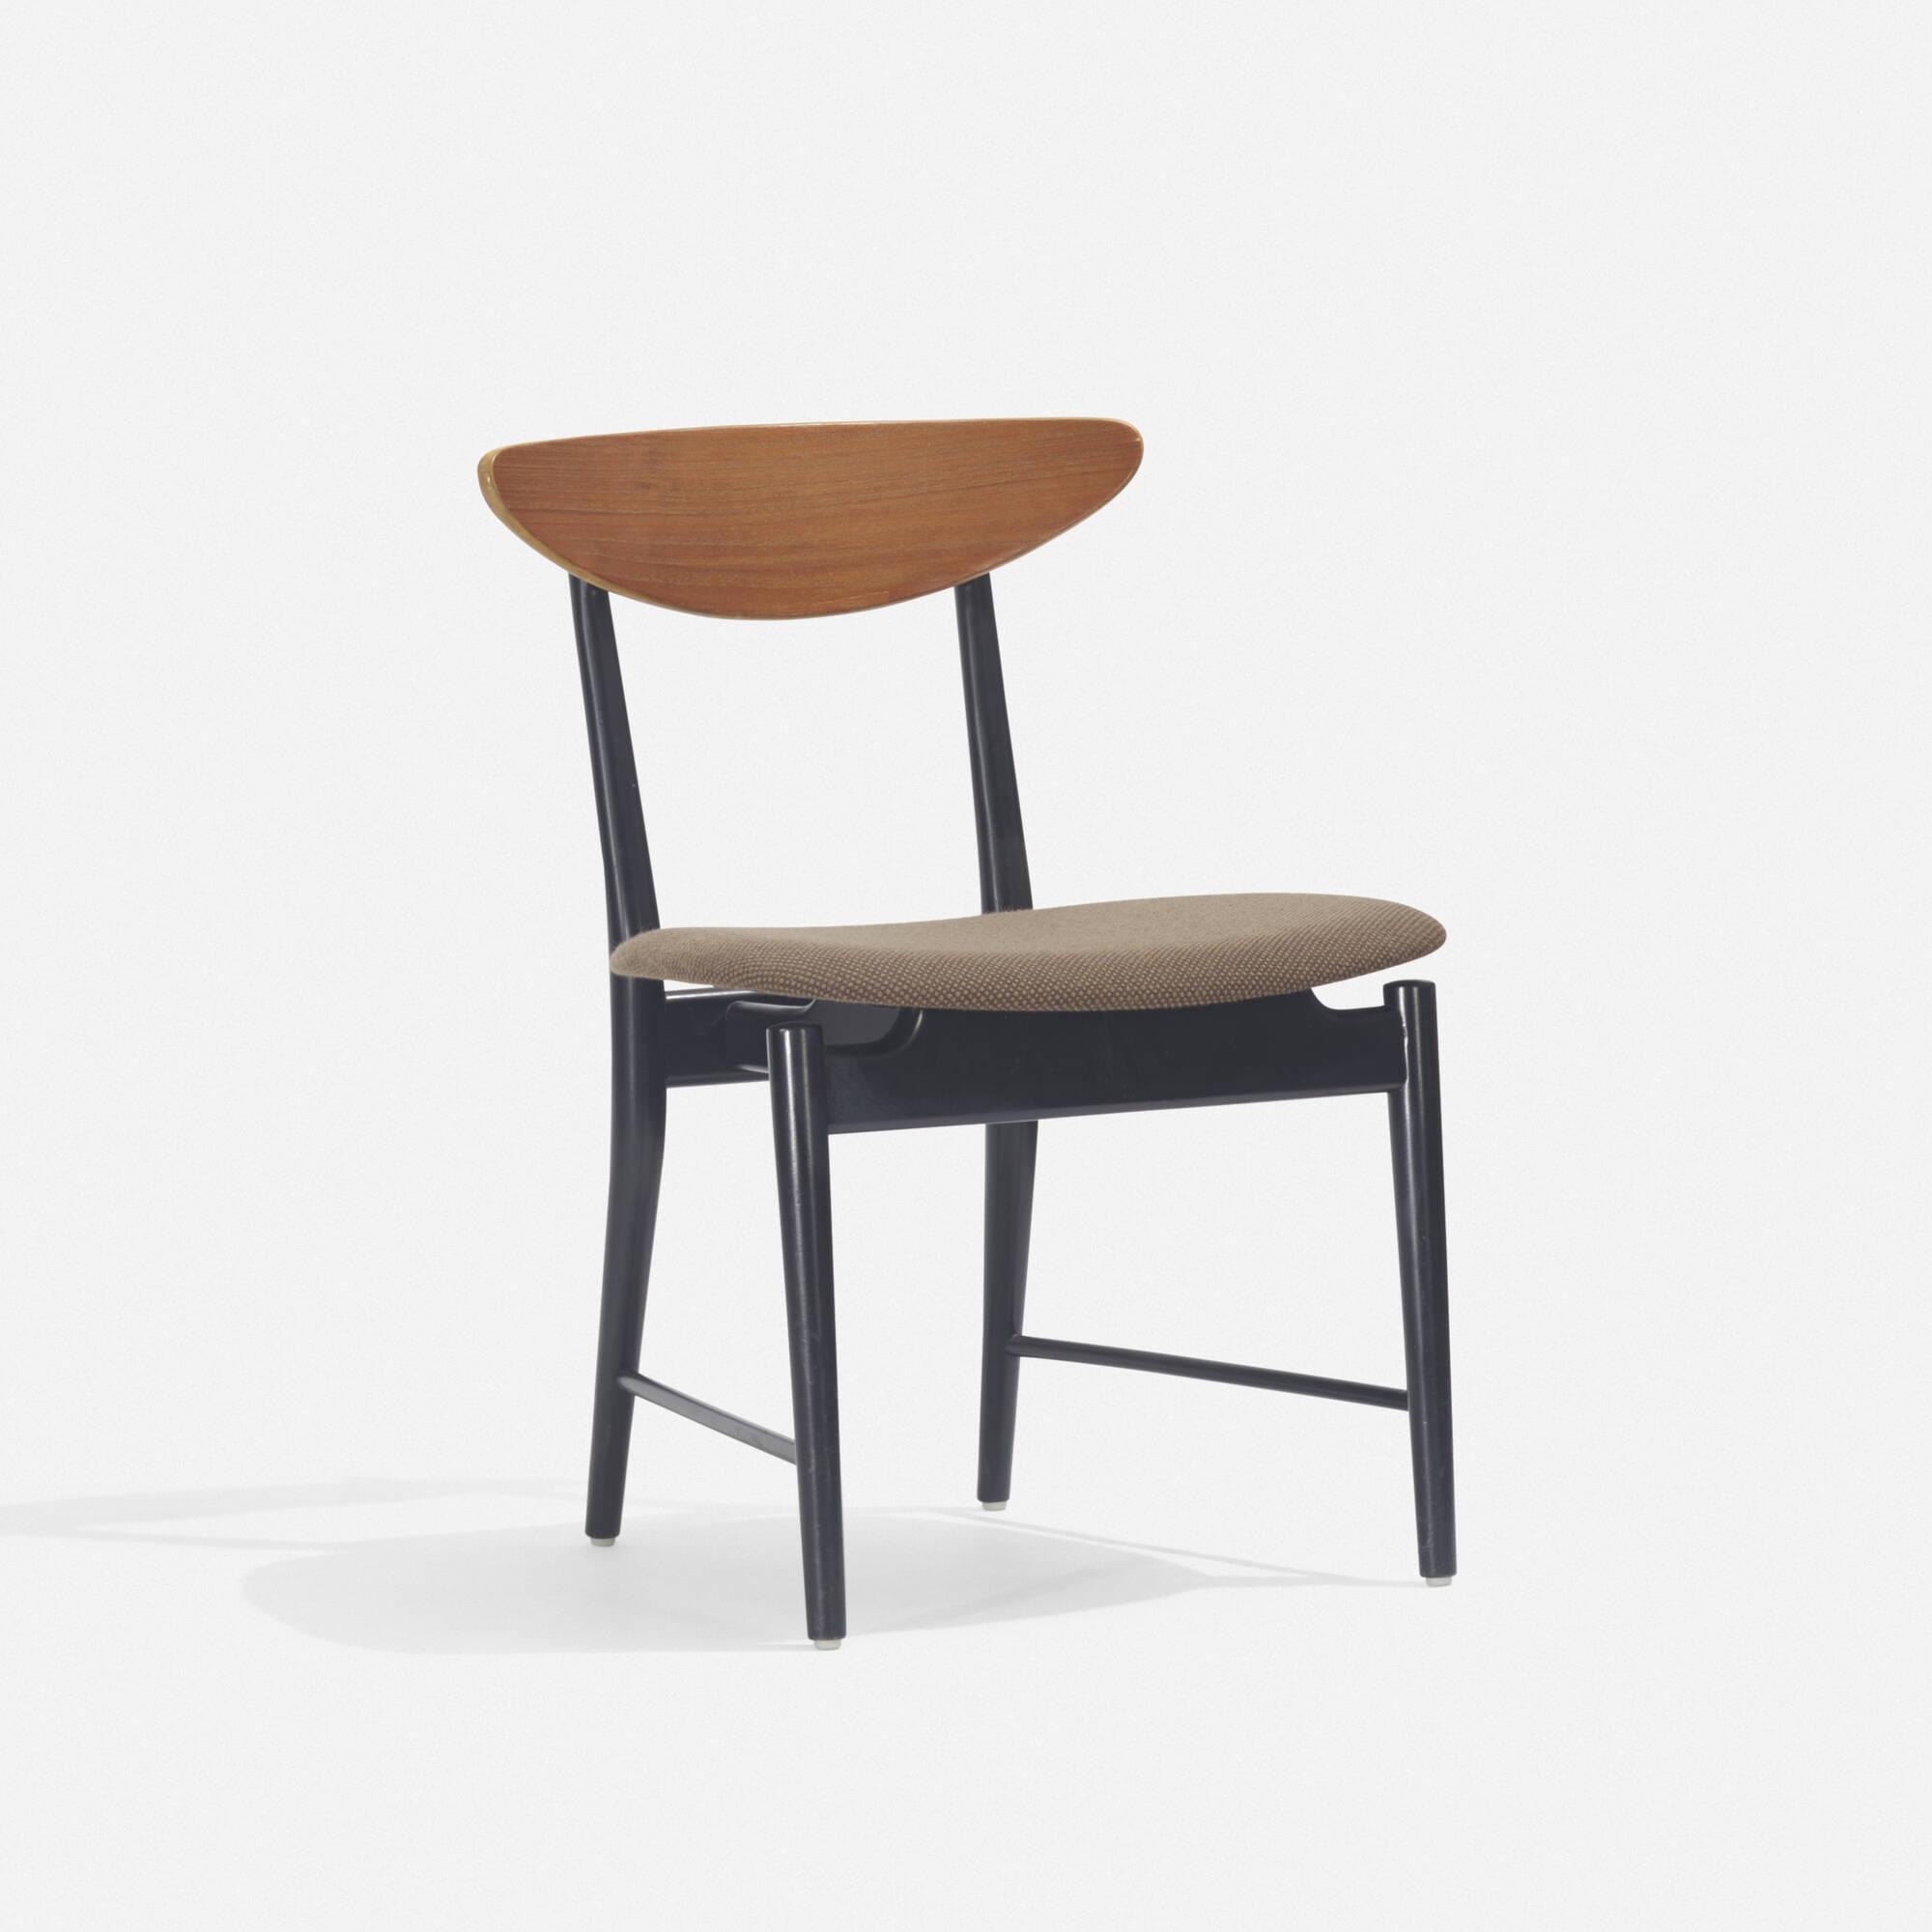 112: Finn Juhl / dining chair (1 of 2)